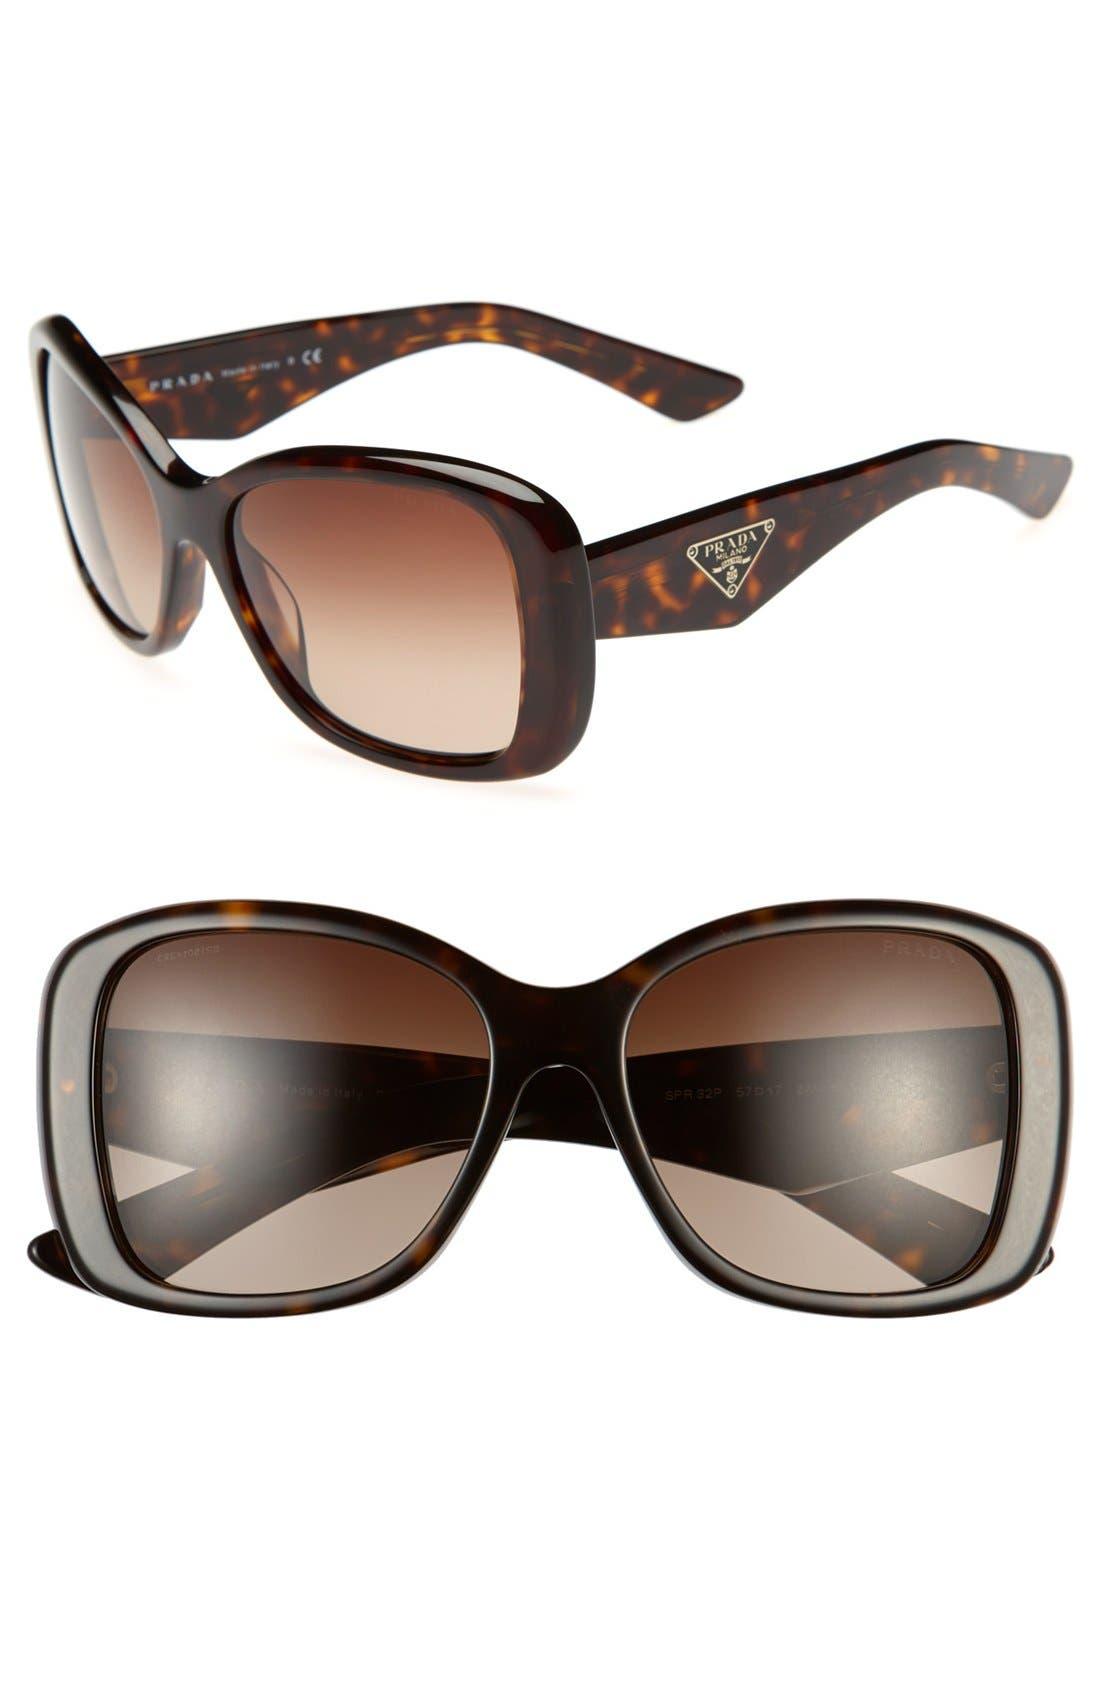 PRADA,                             57mm Oversized Sunglasses,                             Main thumbnail 1, color,                             200